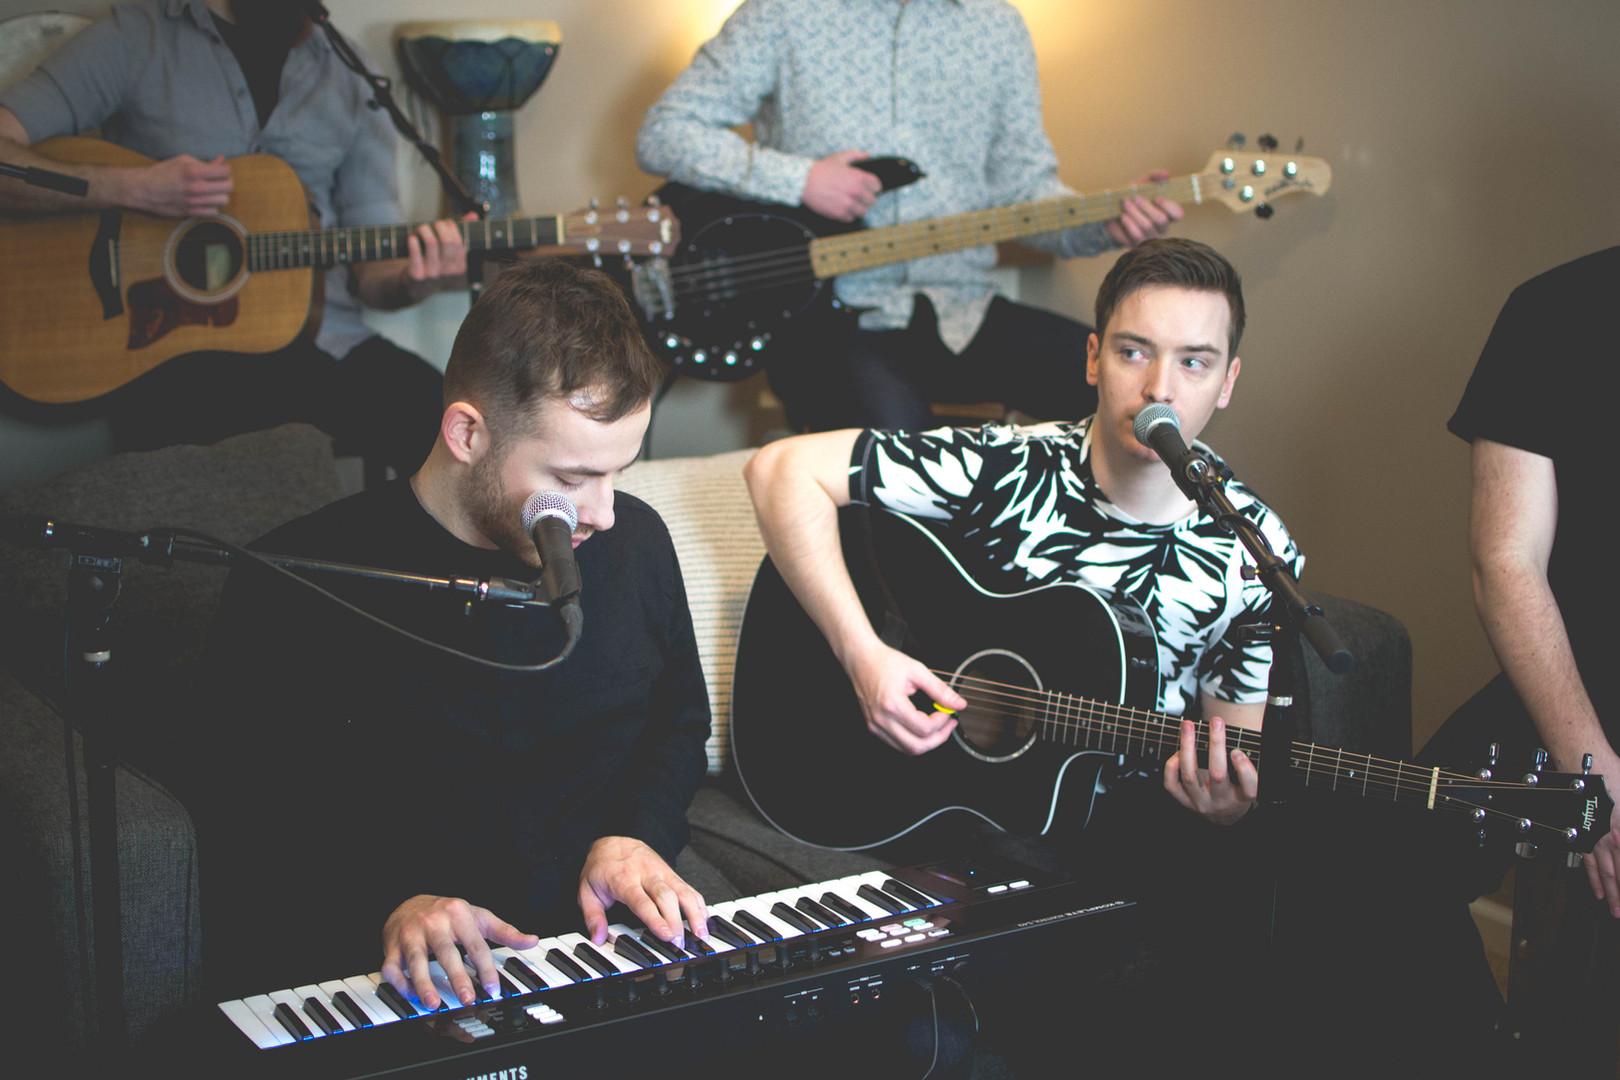 Jared Pace & Ryan Dillon